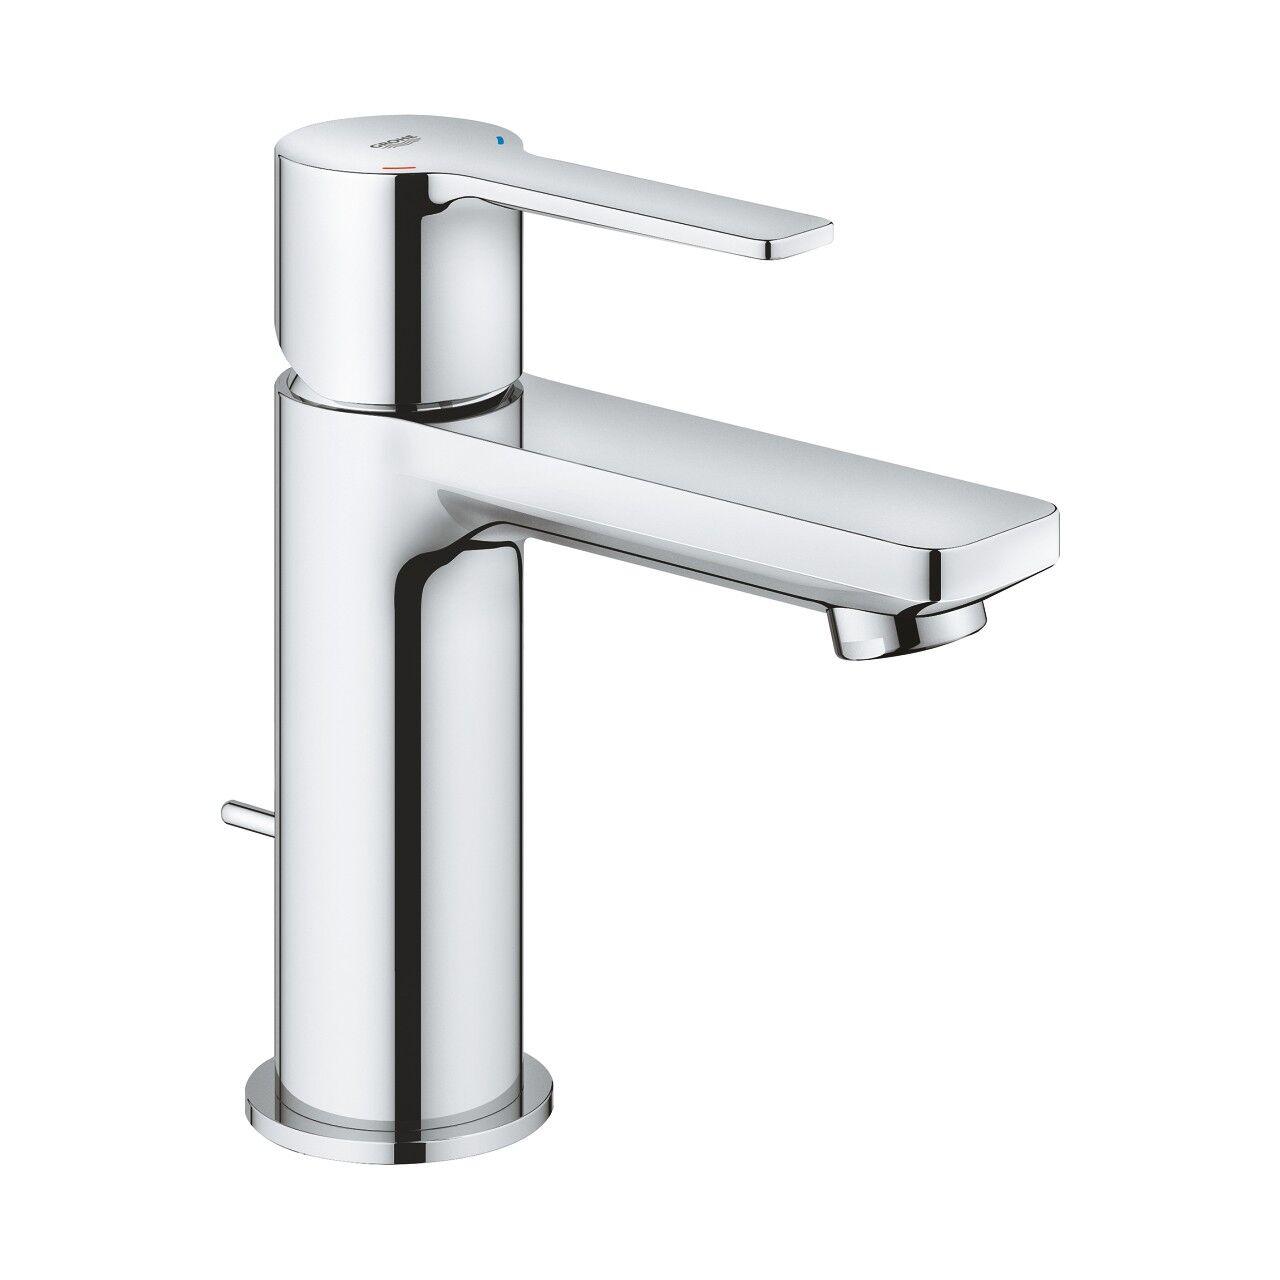 CAESAROO Grohe Lineare Mitigeur monocommande XS pour lavabo 32109001   Chromè